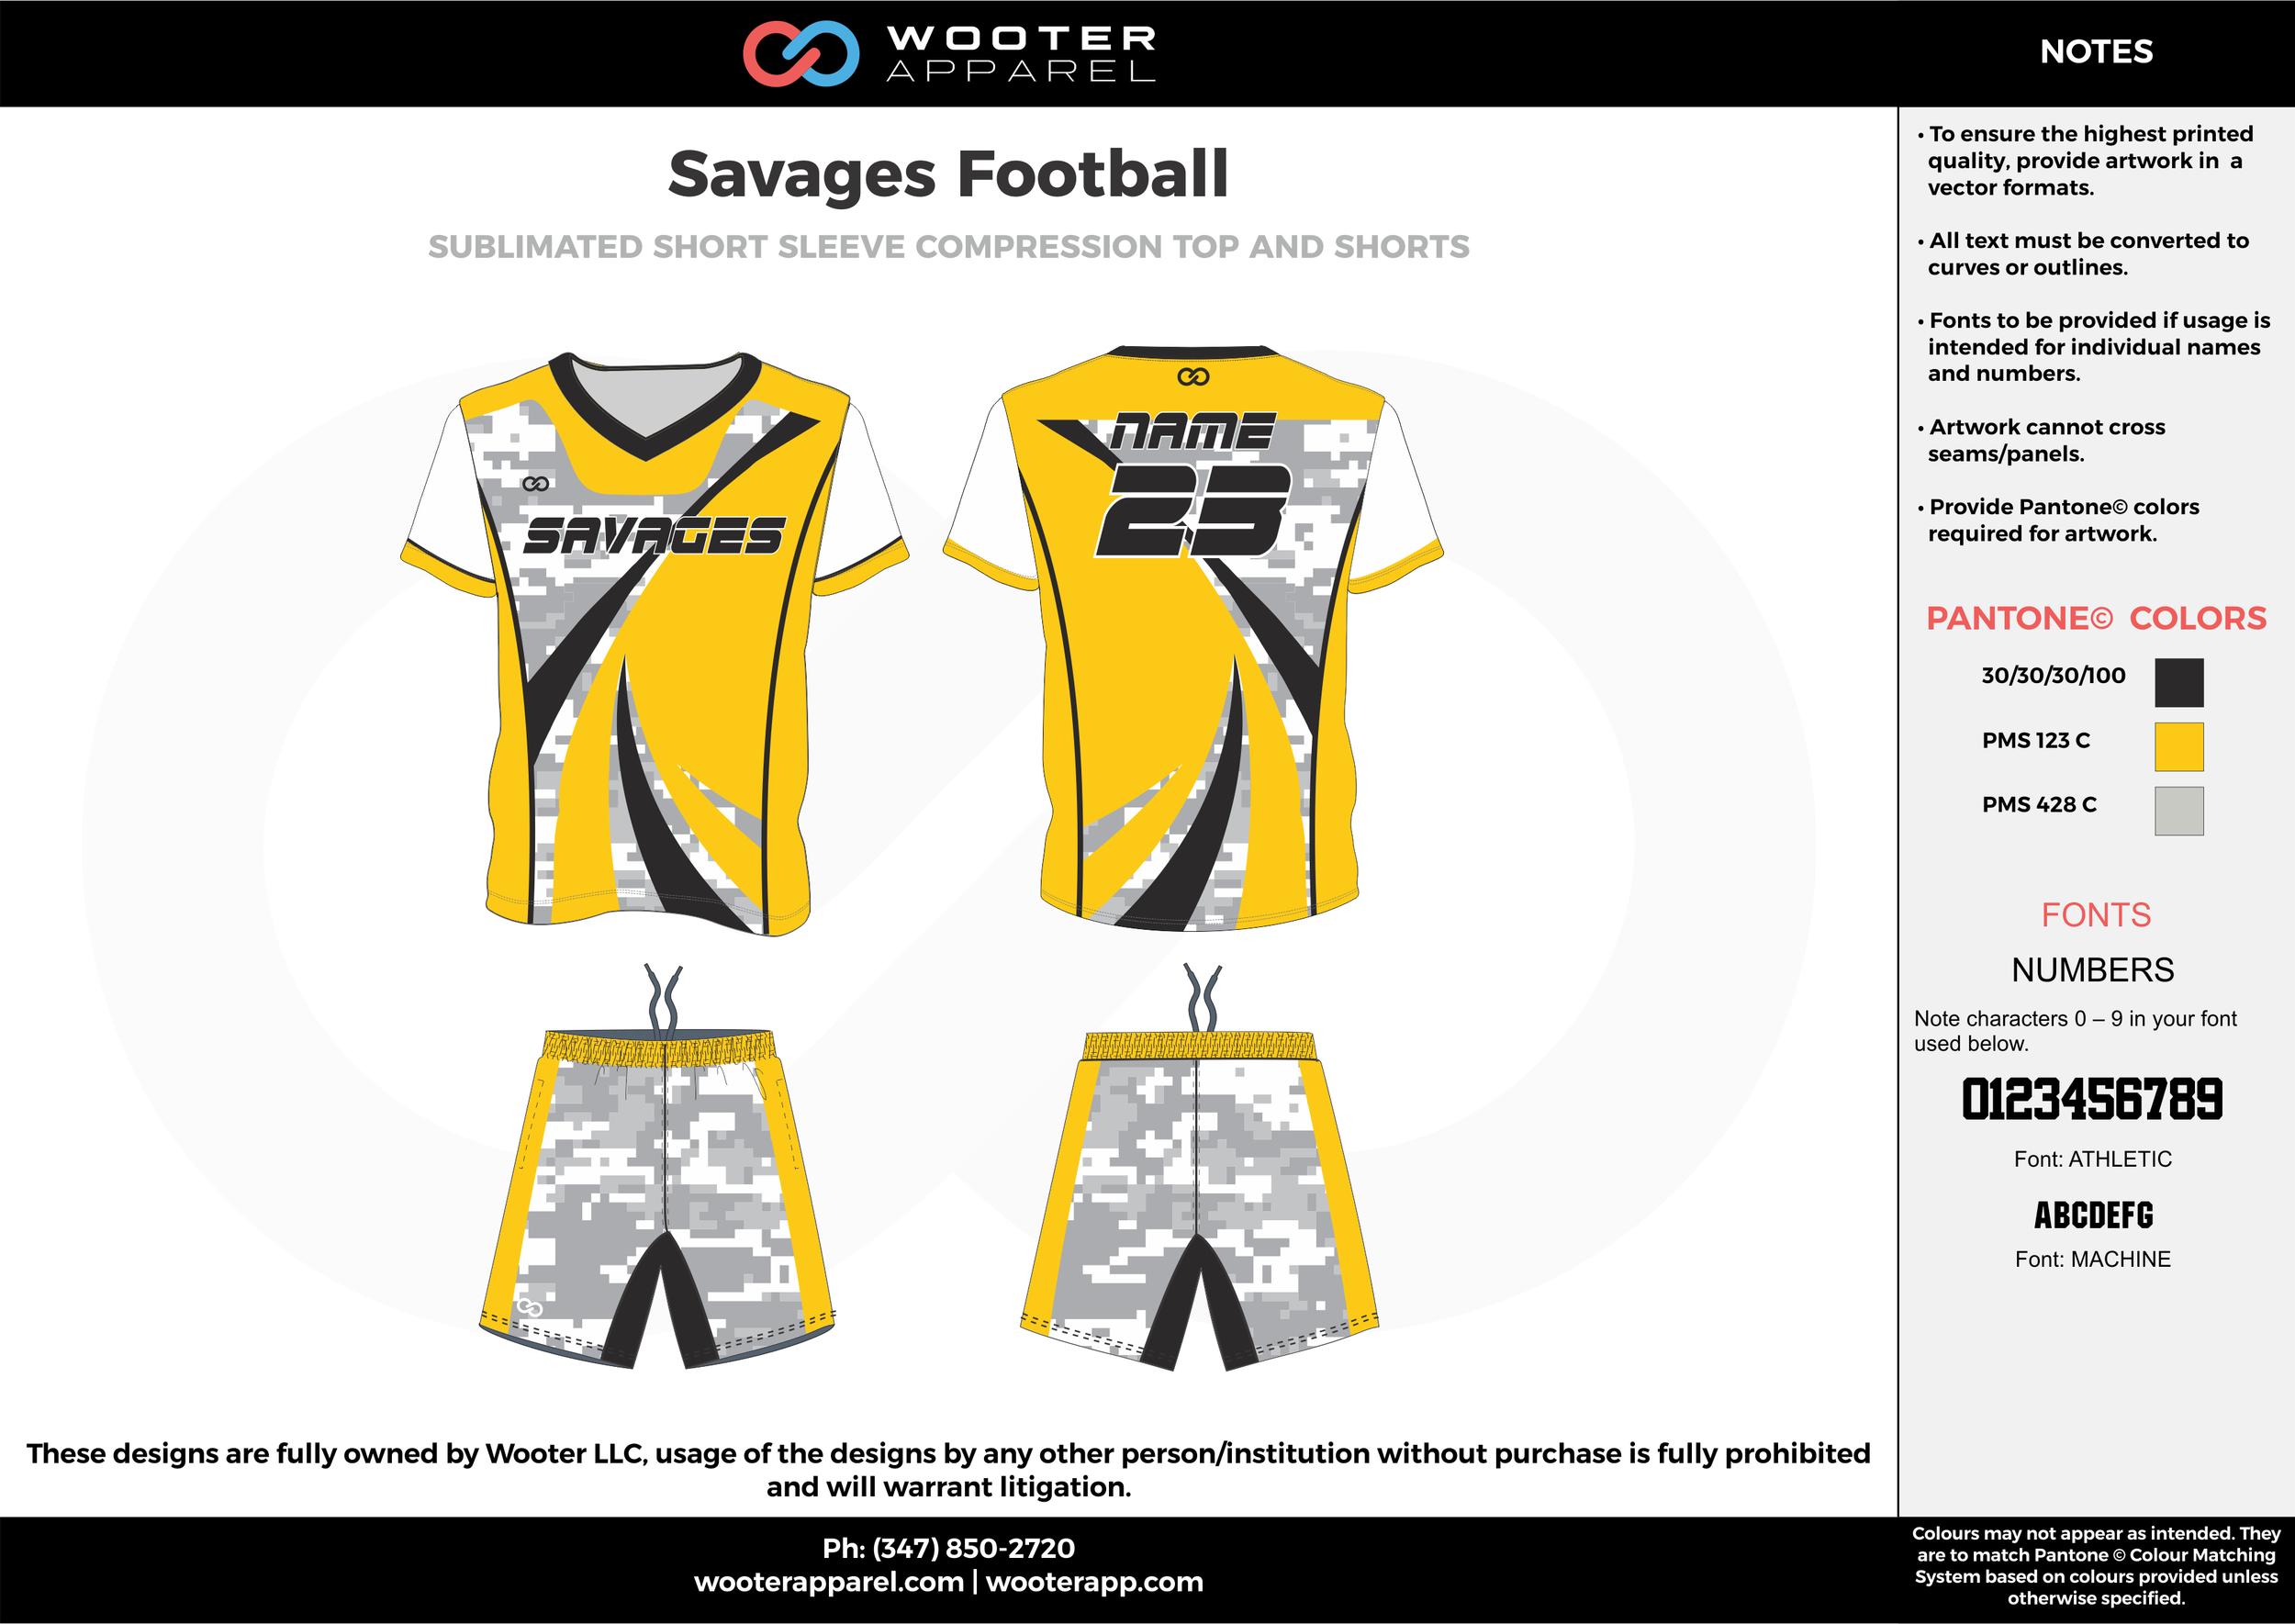 Savages Football yellow white gray football uniforms jerseys shorts